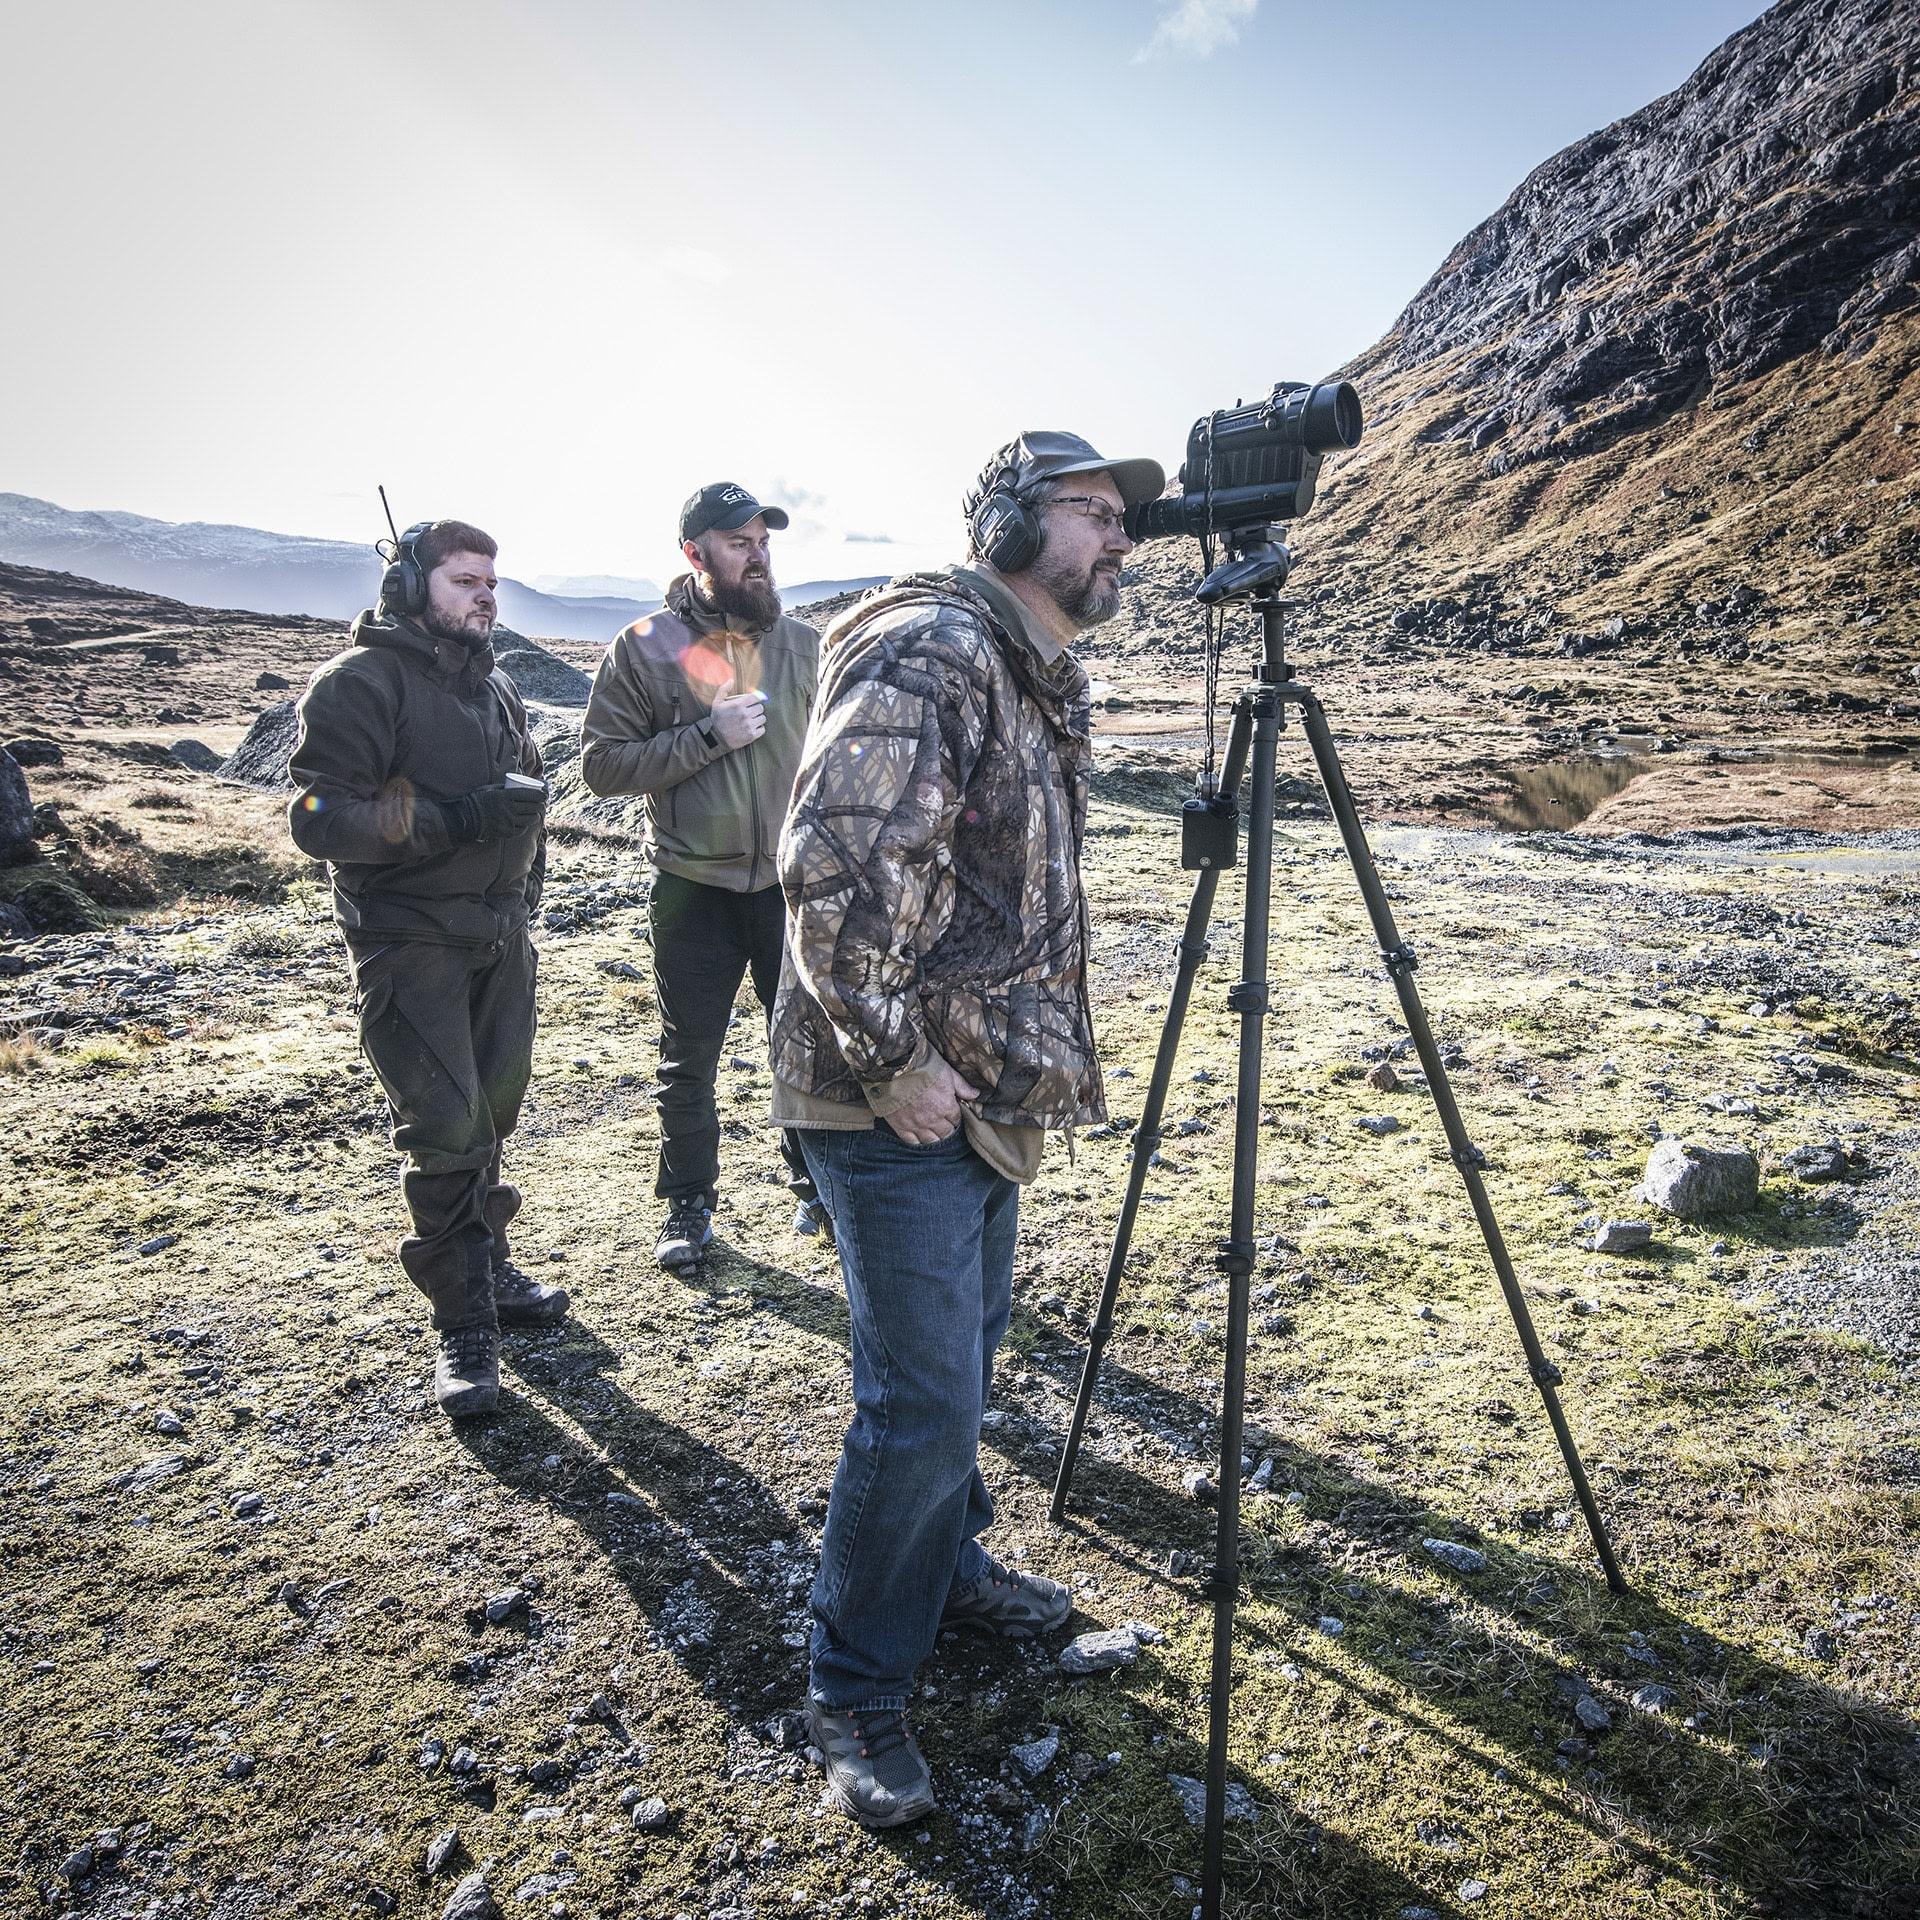 Photo of GRS Oscar, Eivind, Jerry, measuring distances on range